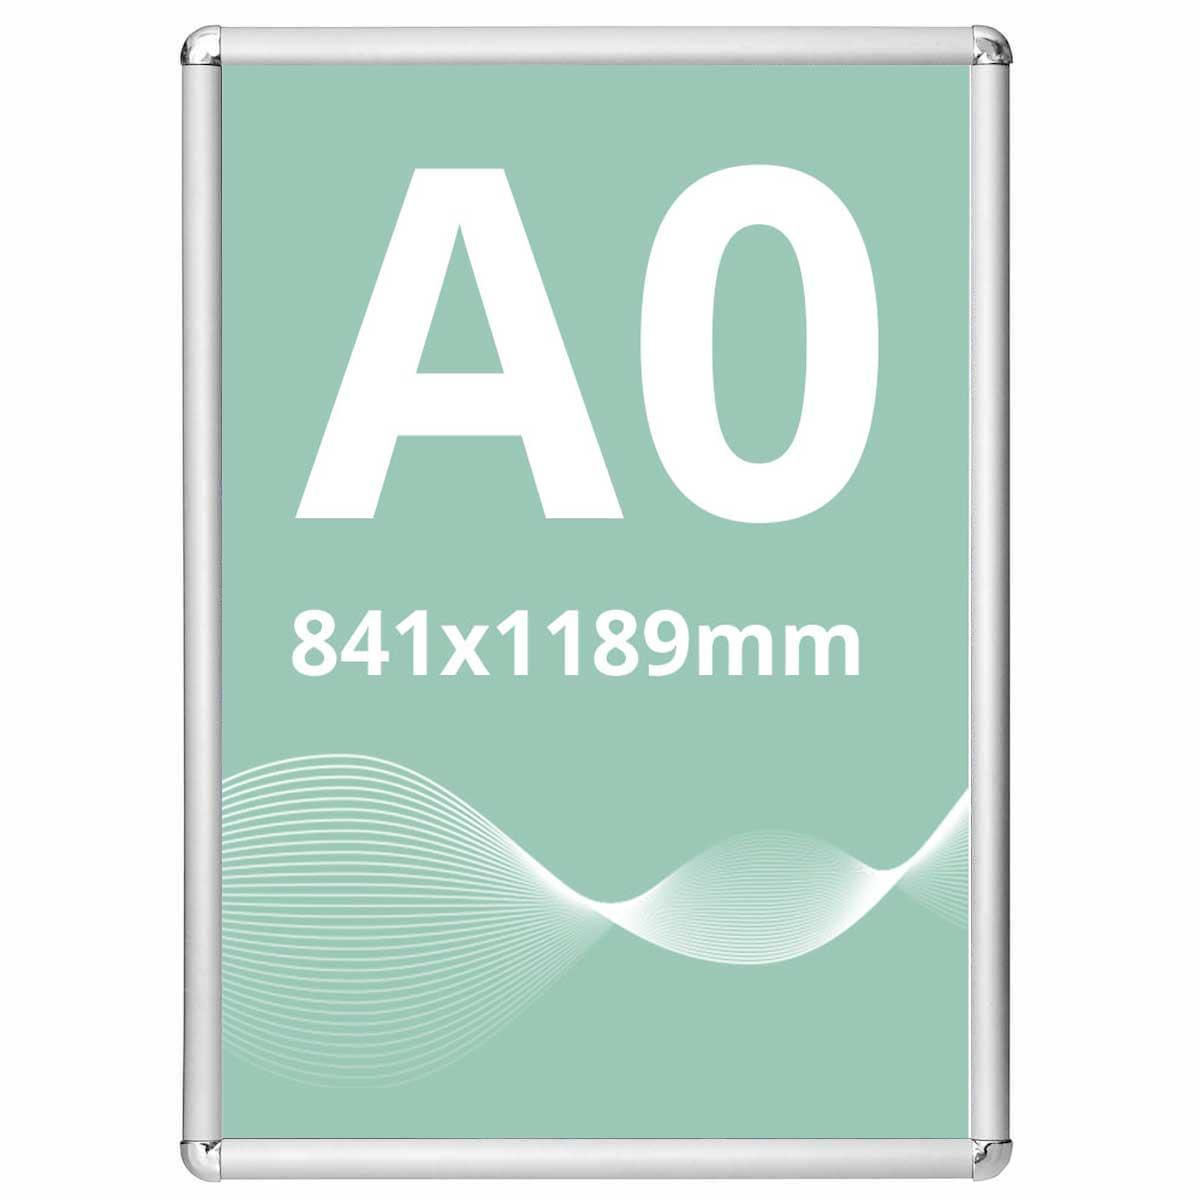 Ramă click Poster Frame din aluminiu 25, colțuri rotunde A0, JJ DISPLAYS, 841 x 1189 mm